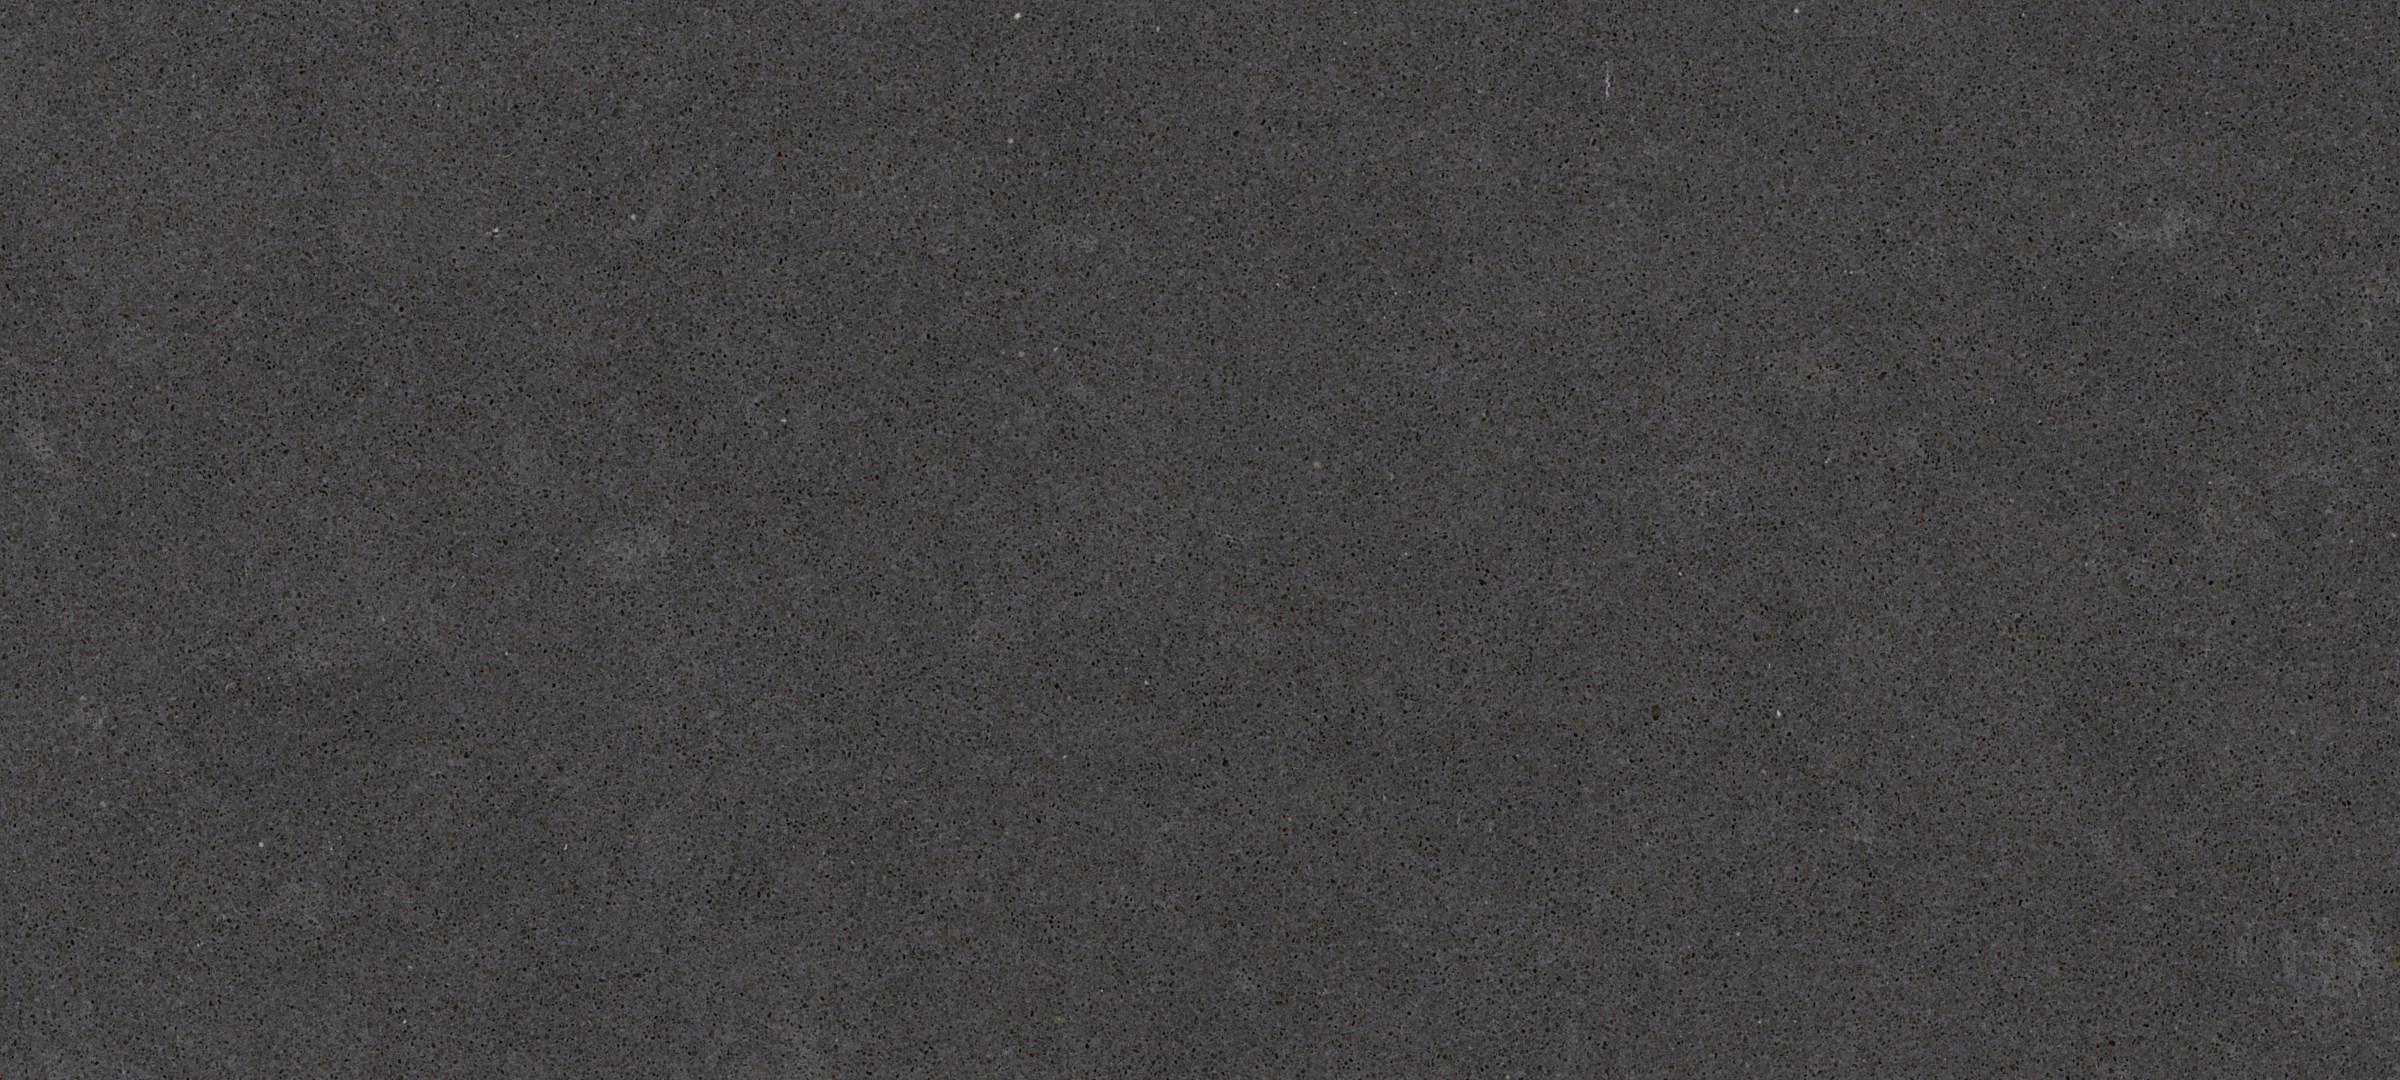 Raven 4120  Granite Countertops Seattle